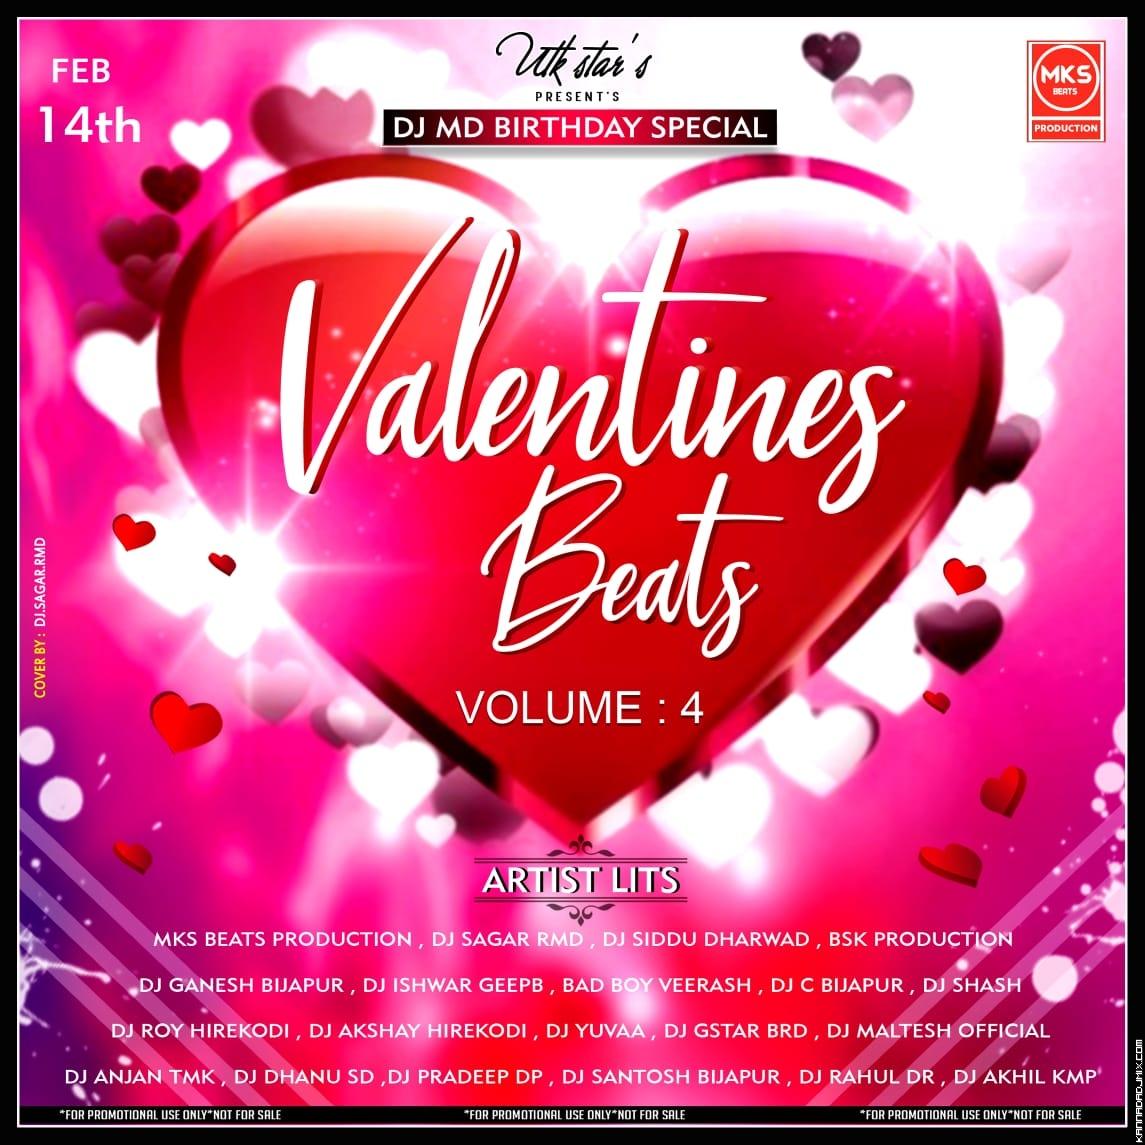 10-SAGARIYE LOVE MIX - DJ ROY HIREKODI x DJ AKSHAY HIREKODI.mp3